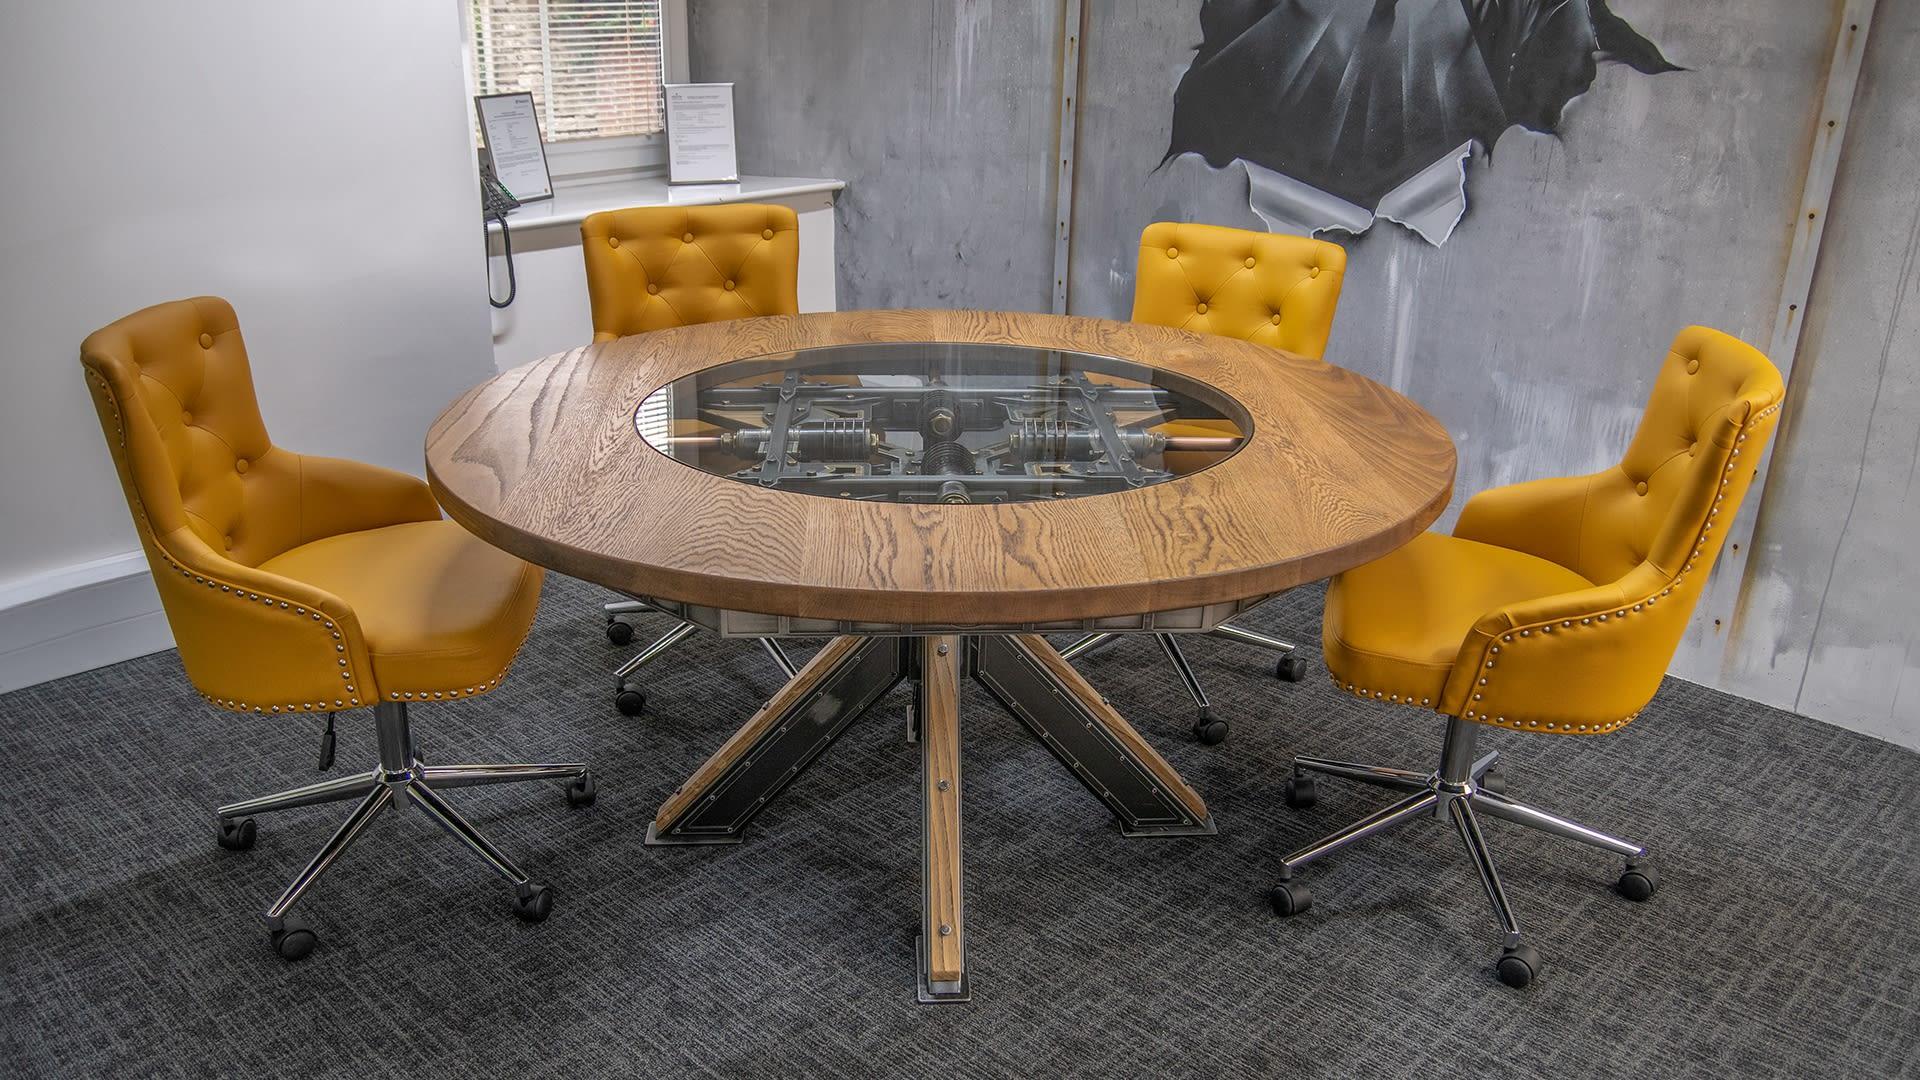 Steel Vintage - Steampunk Round Table - Industrial Furniture